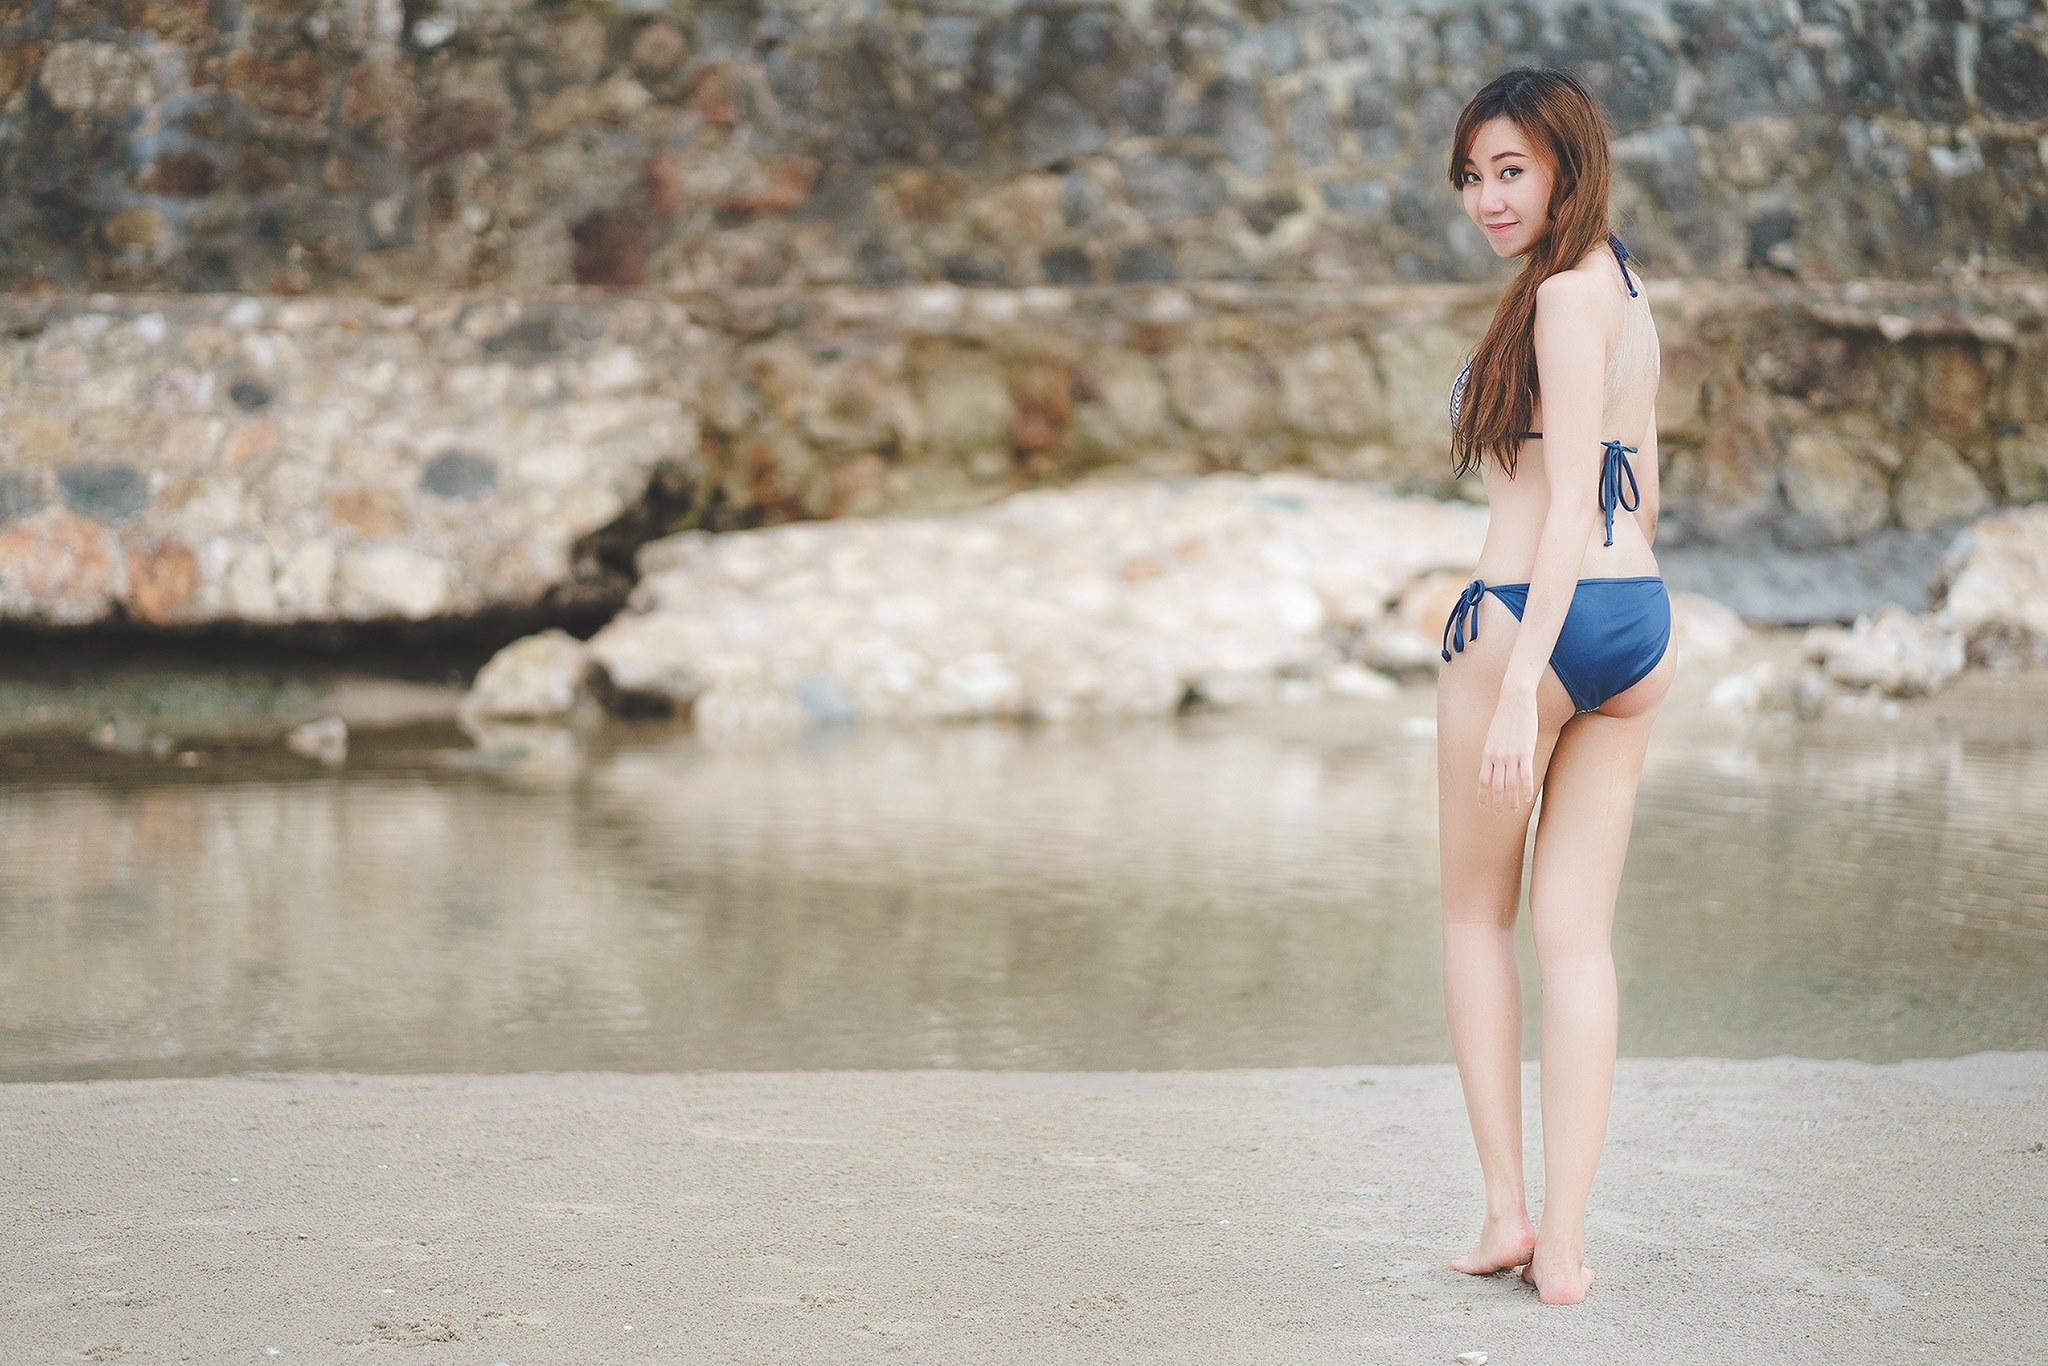 Let's Sea - Busakon Suwannil